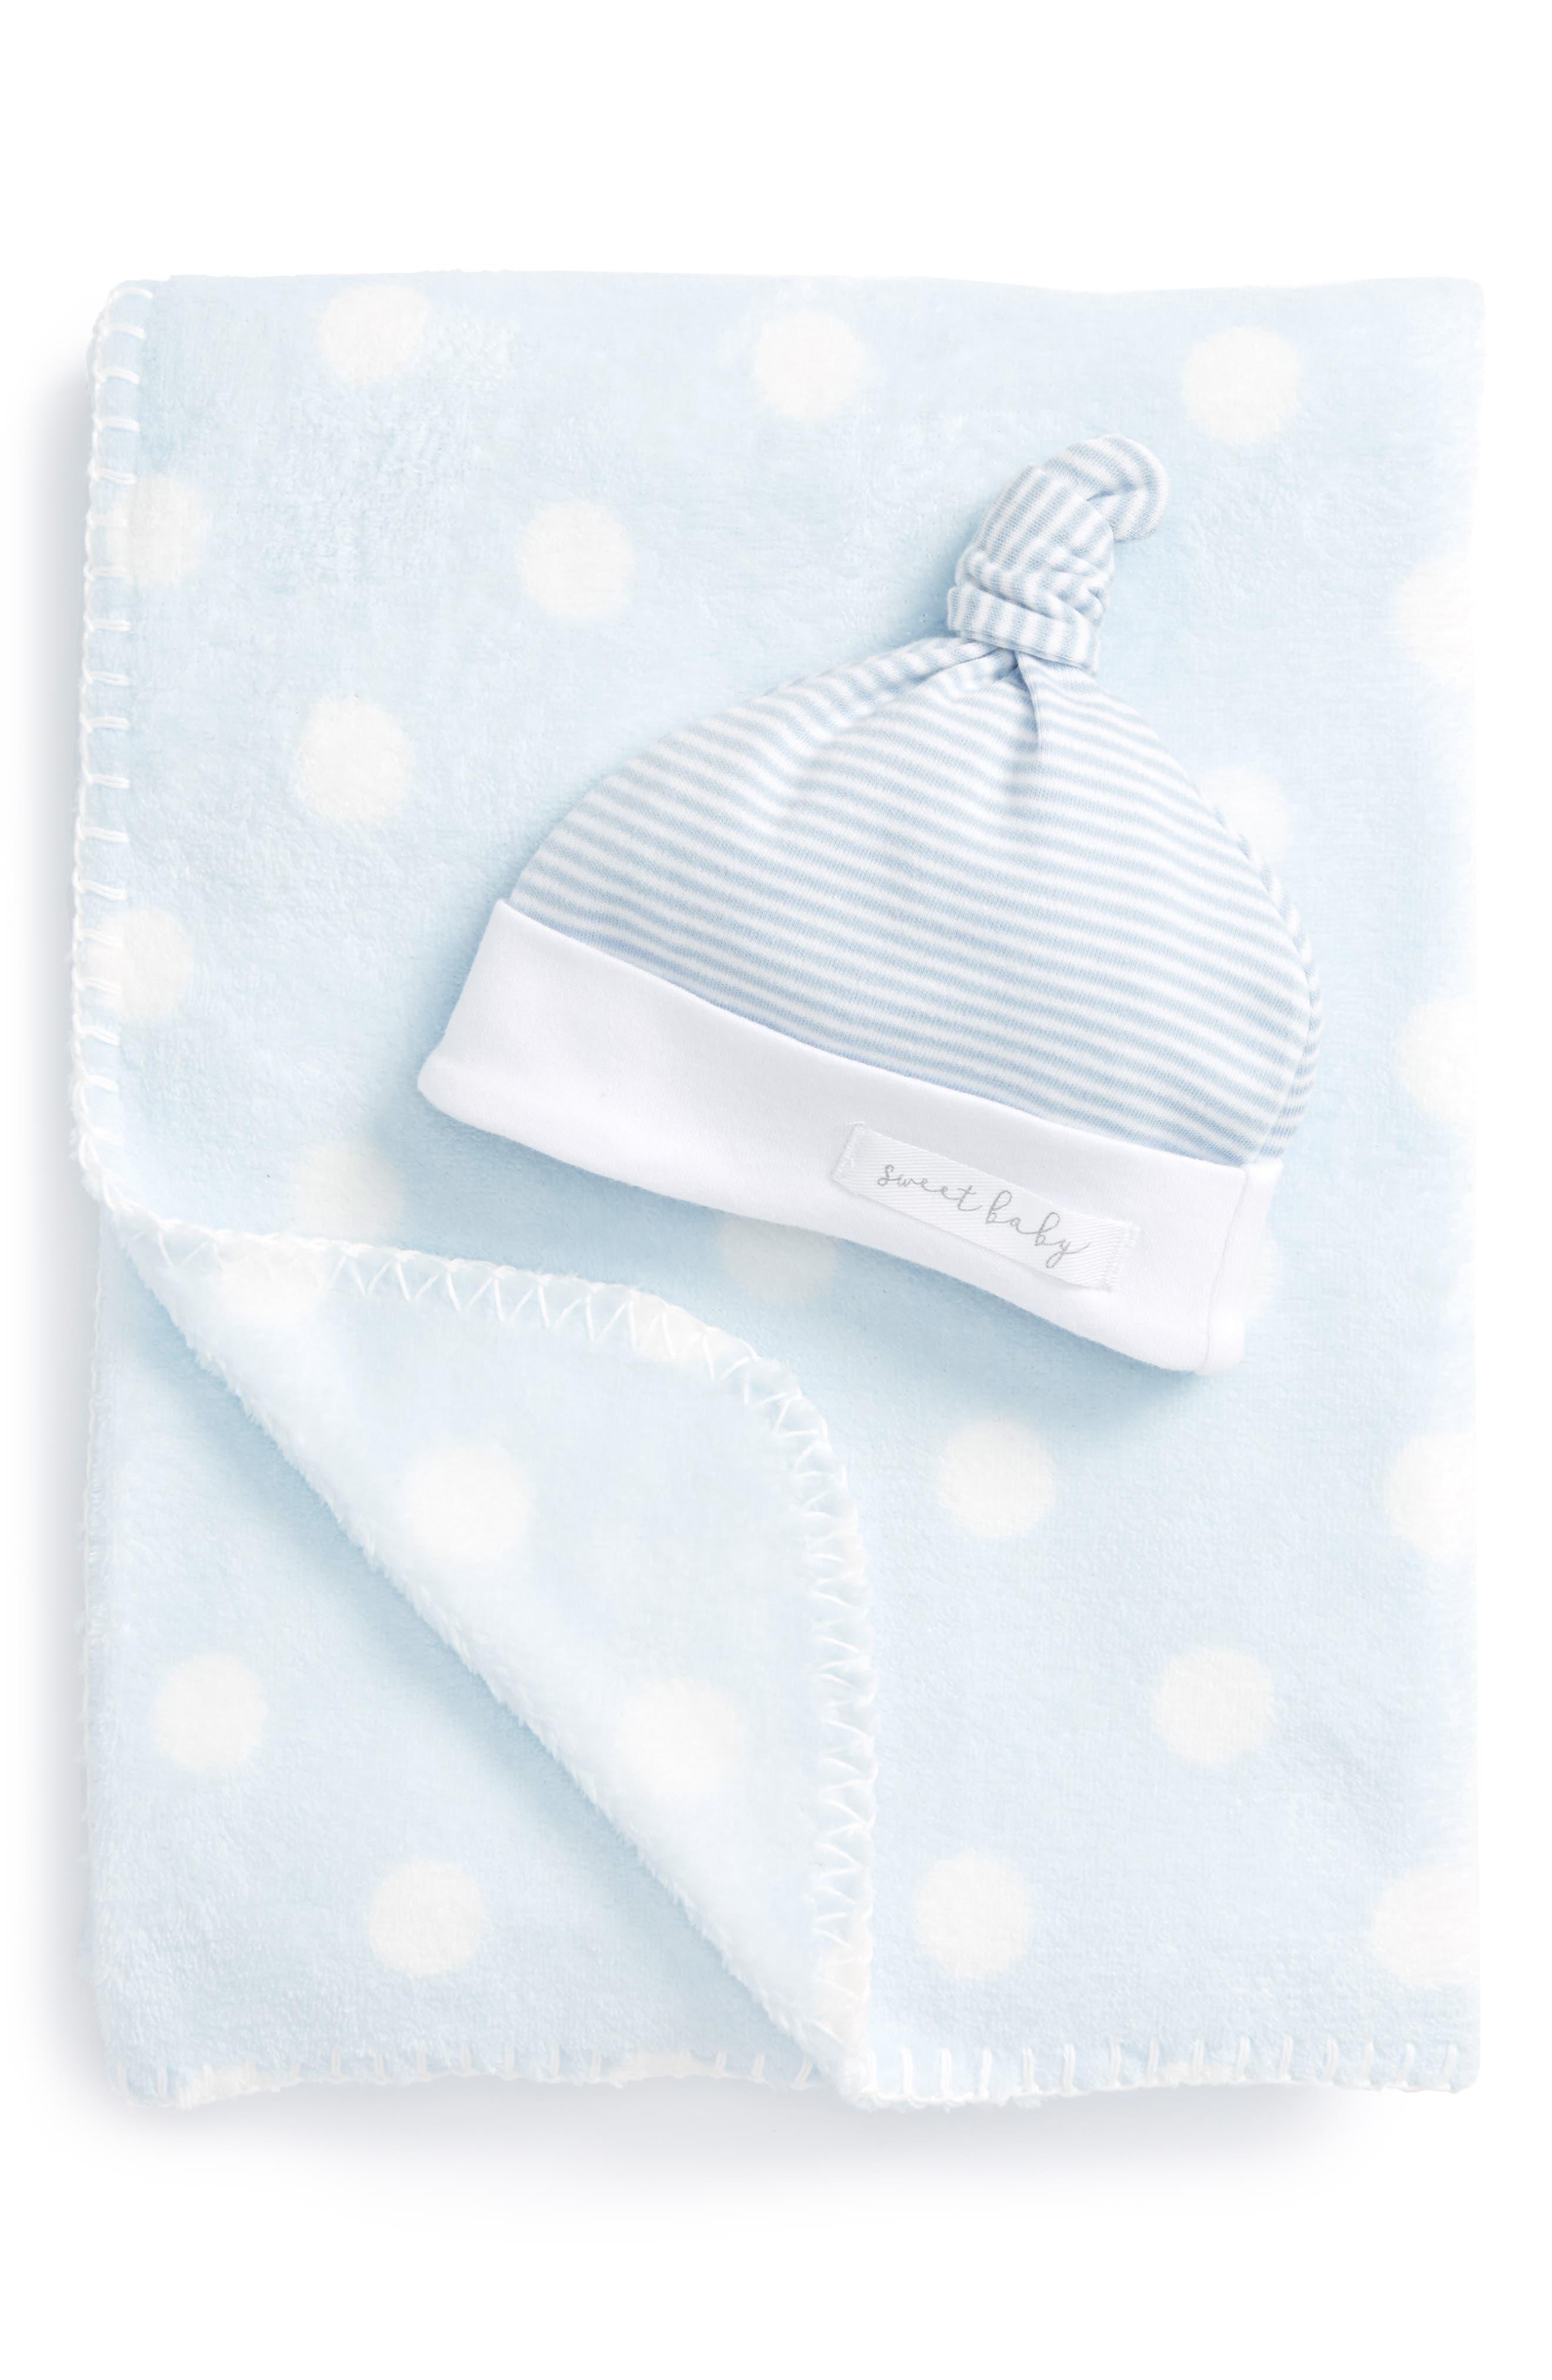 Sweet Baby Receiving Blanket & Hat Set,                         Main,                         color, Blue